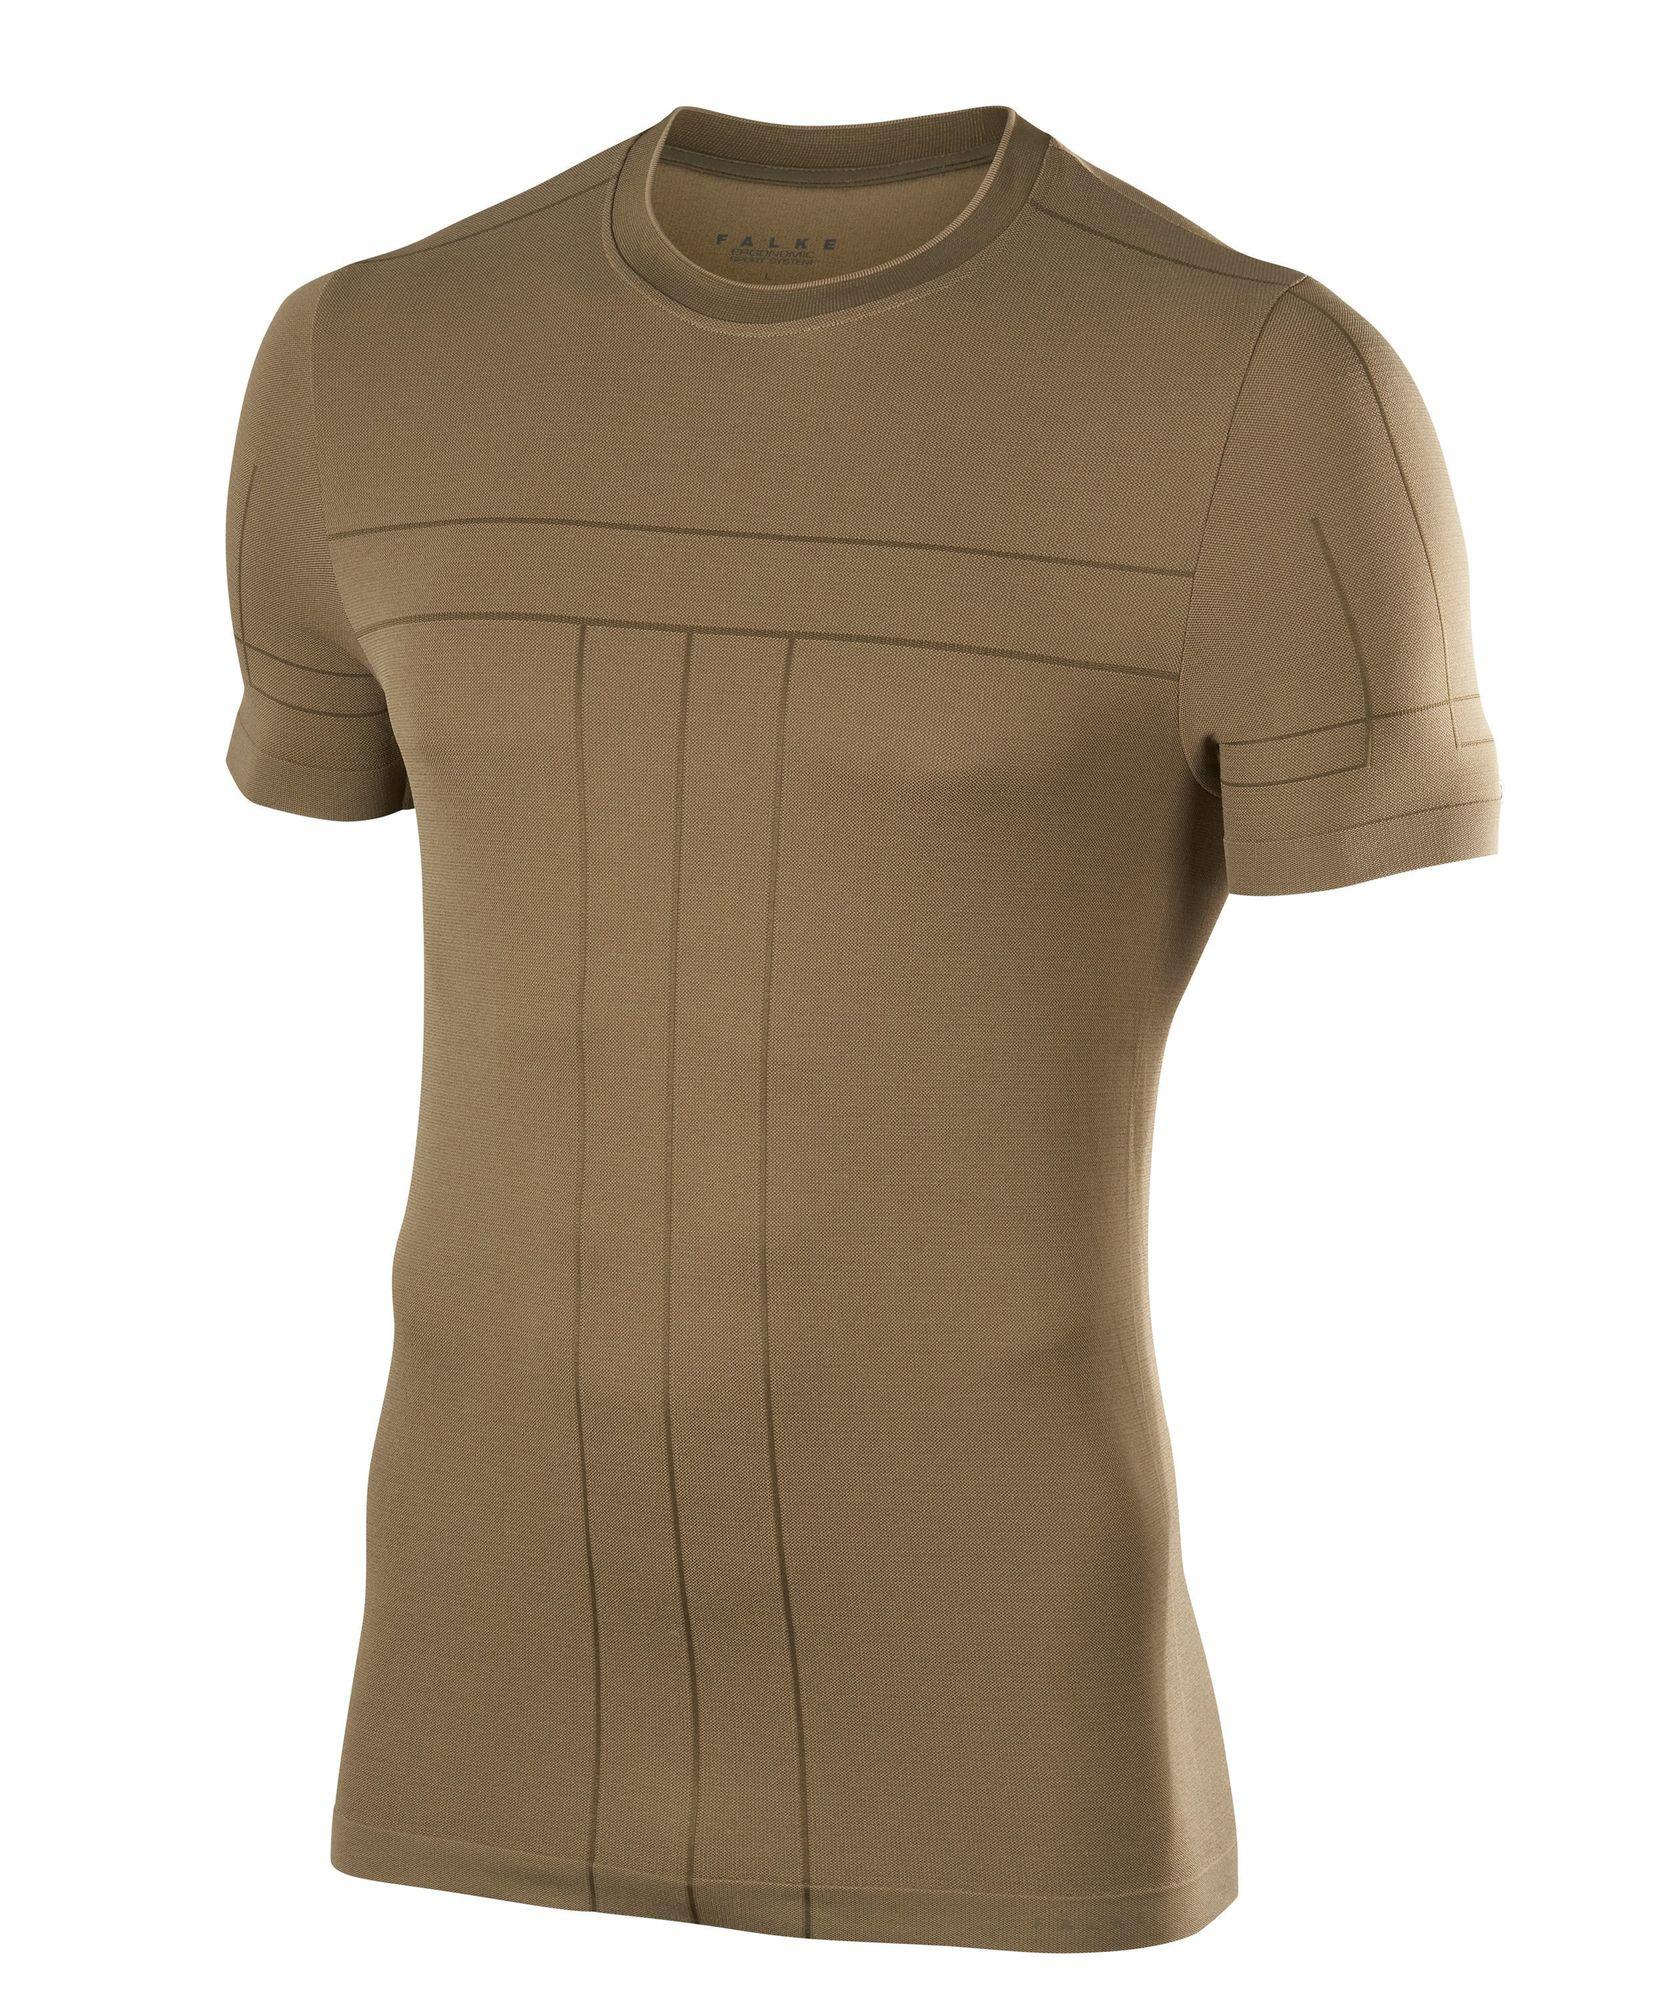 Falke Basic T-Shirt in Beige Khaki